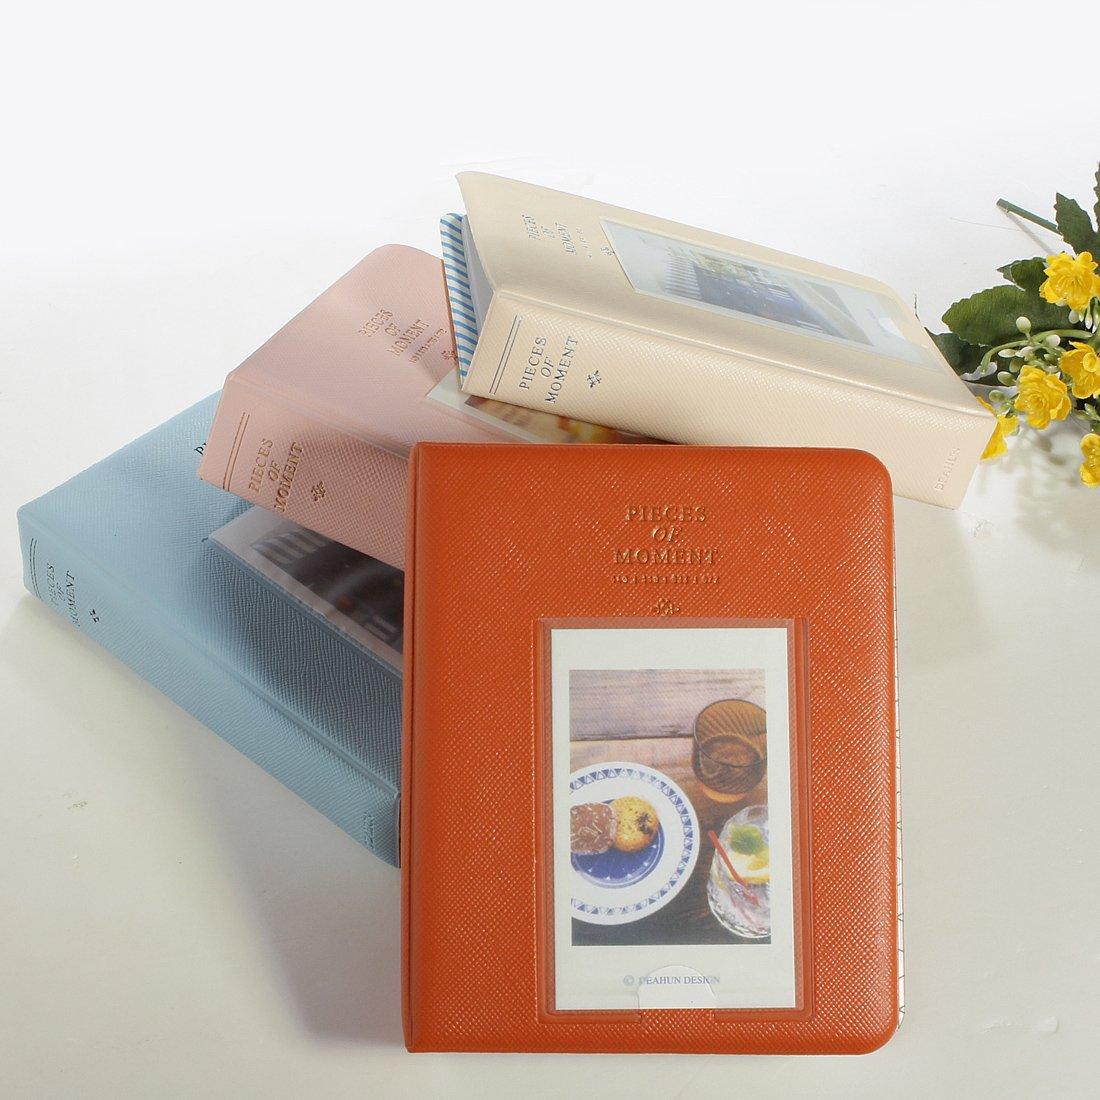 vicfeed 64bolsillos Mini Album Caso de almacenamiento para fotos Polaroid) FMISSACGHJH597